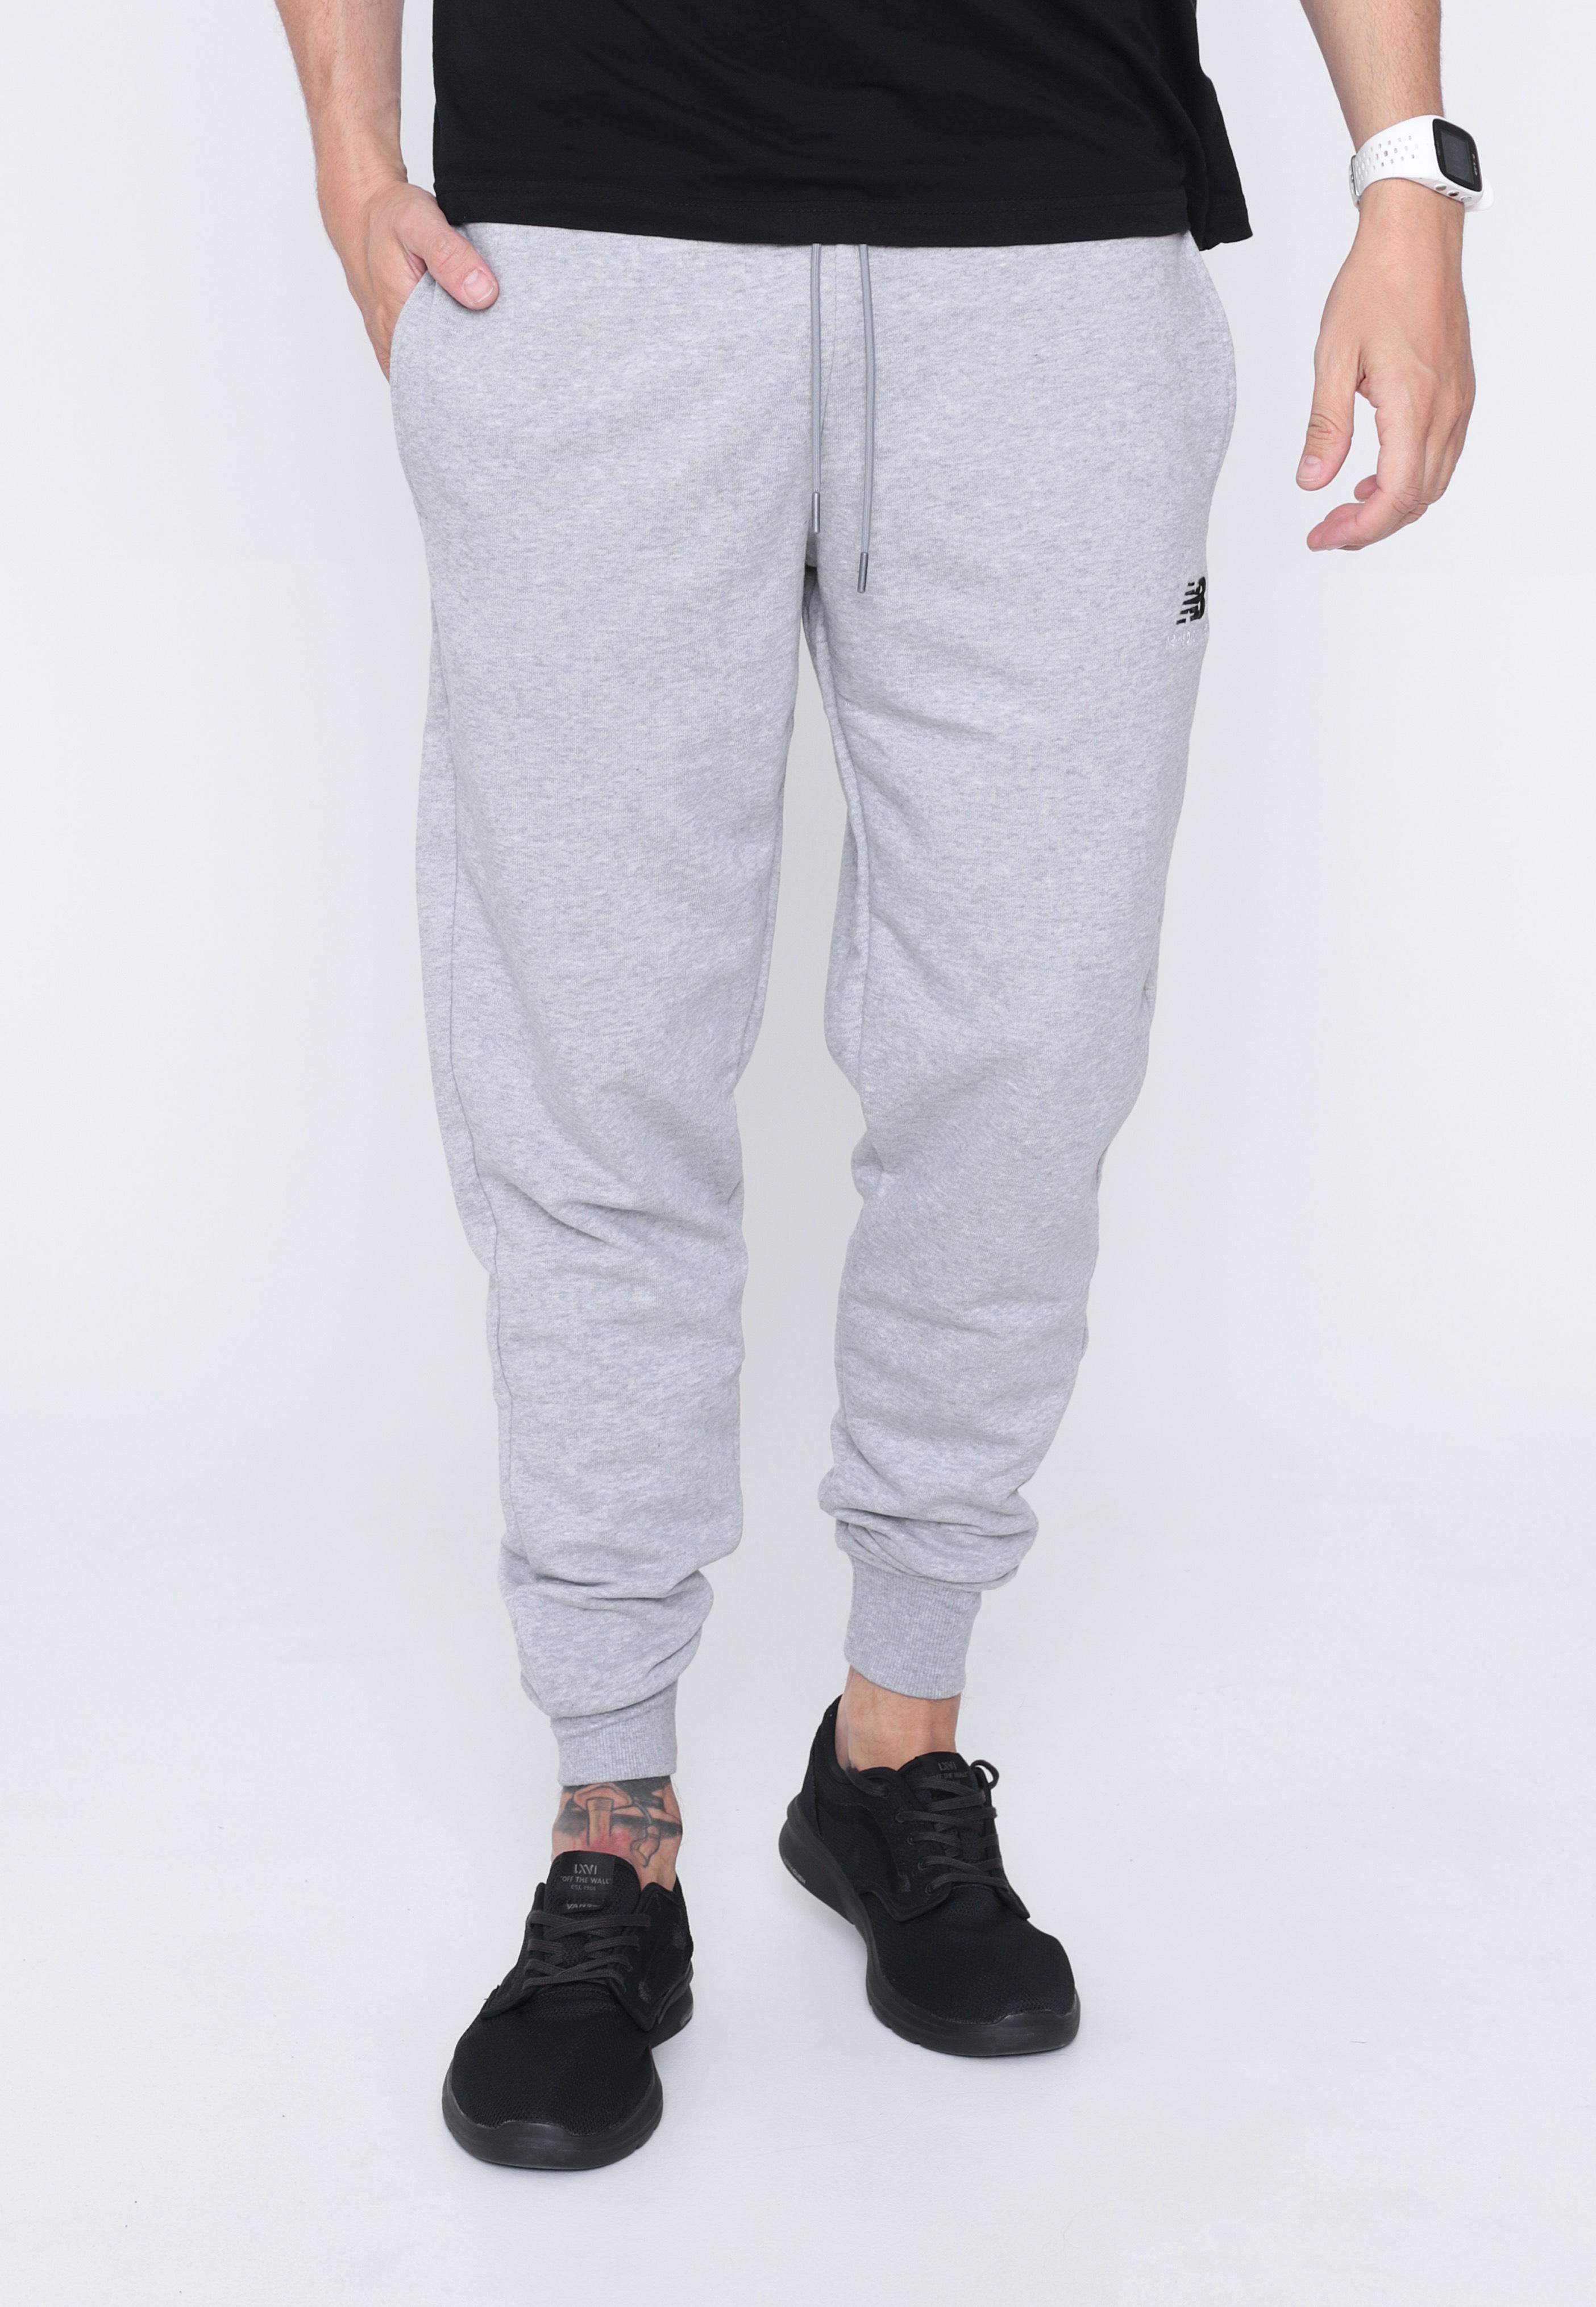 New Balance - MP11590 Athletic Grey - Sweatpants